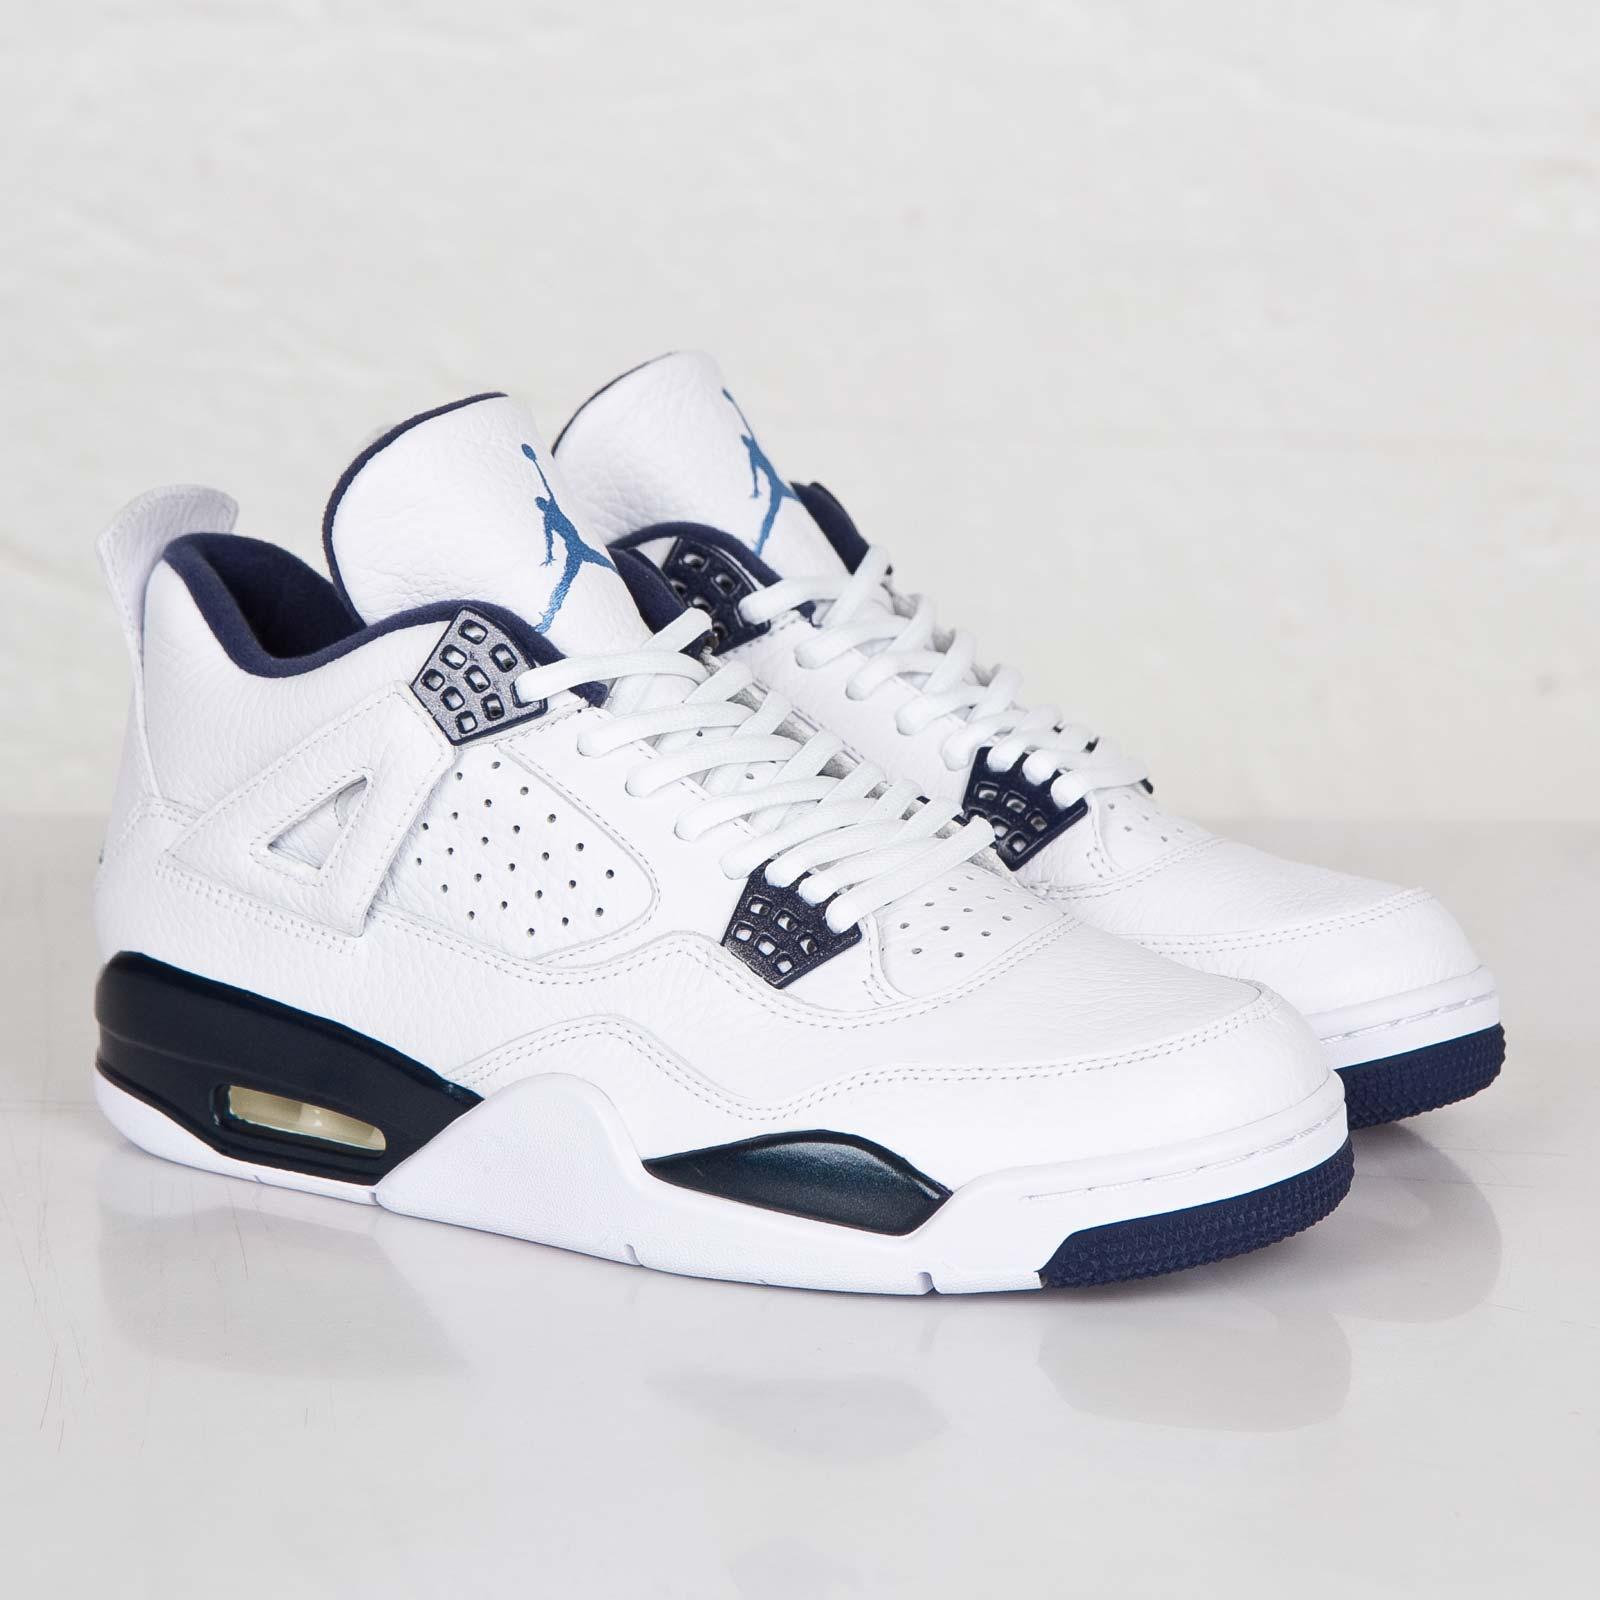 Jordan Brand Air Jordan 4 Retro LS